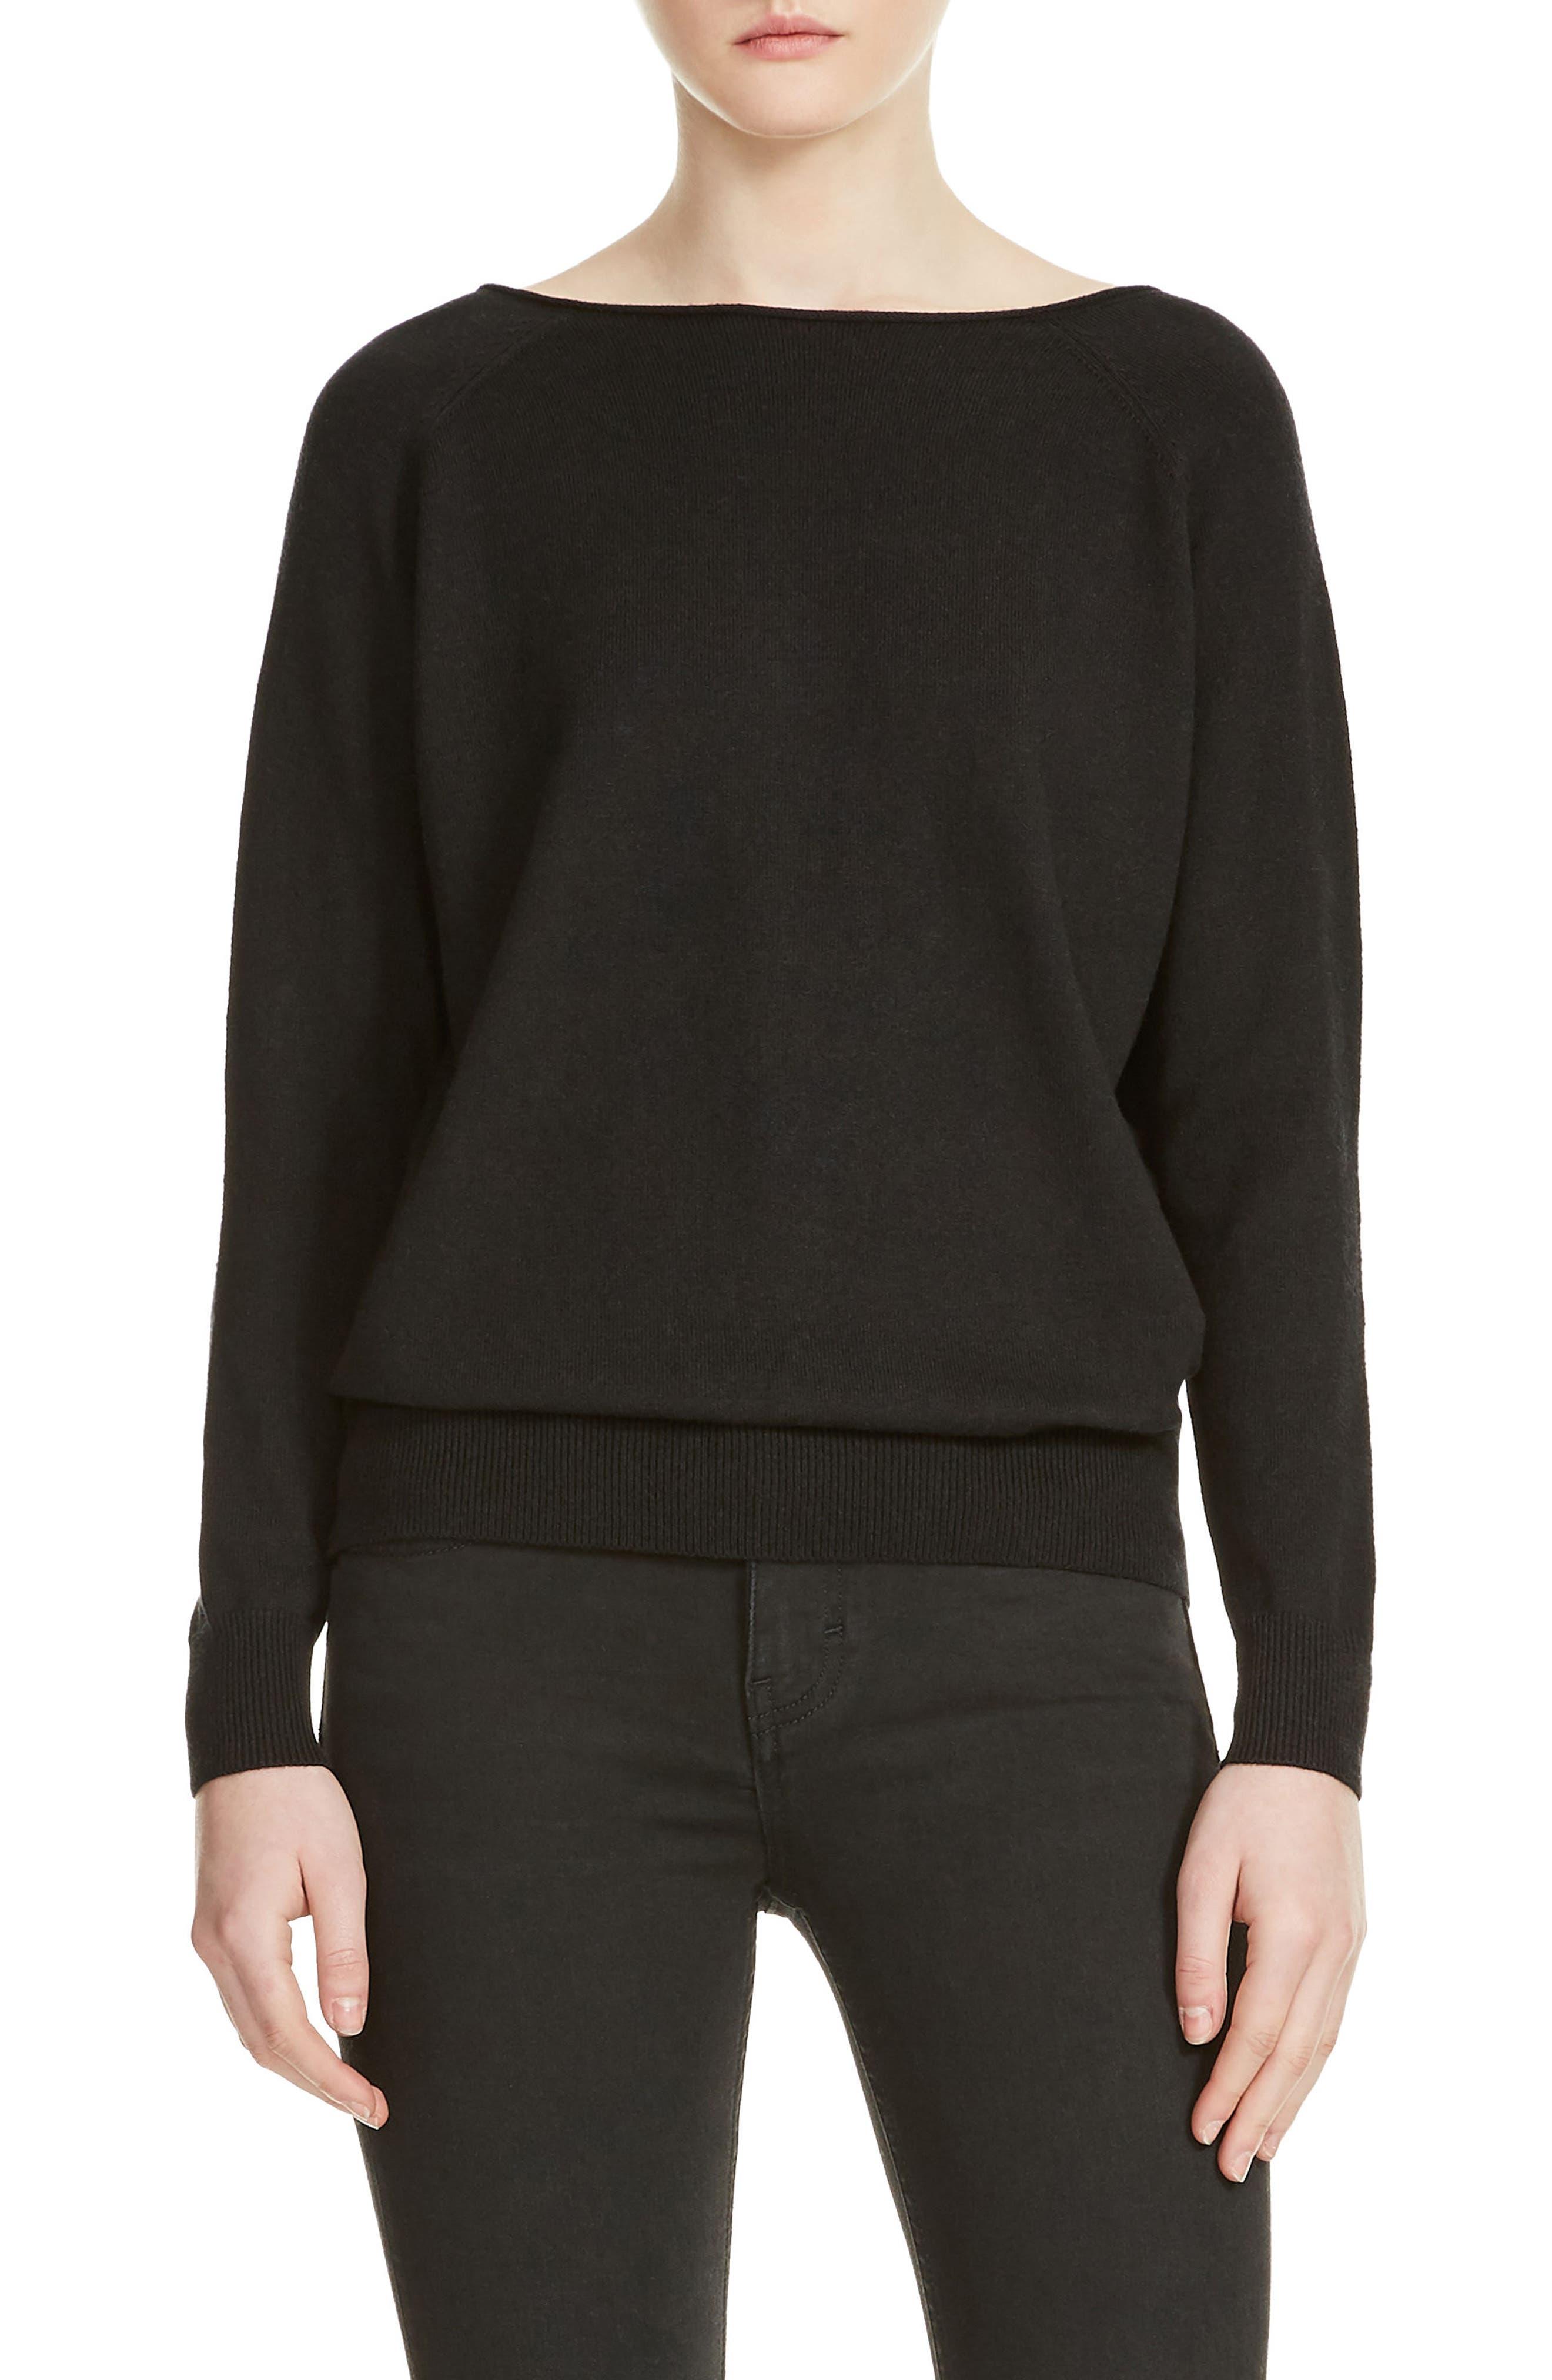 Macademia Chain Back Sweater,                         Main,                         color,